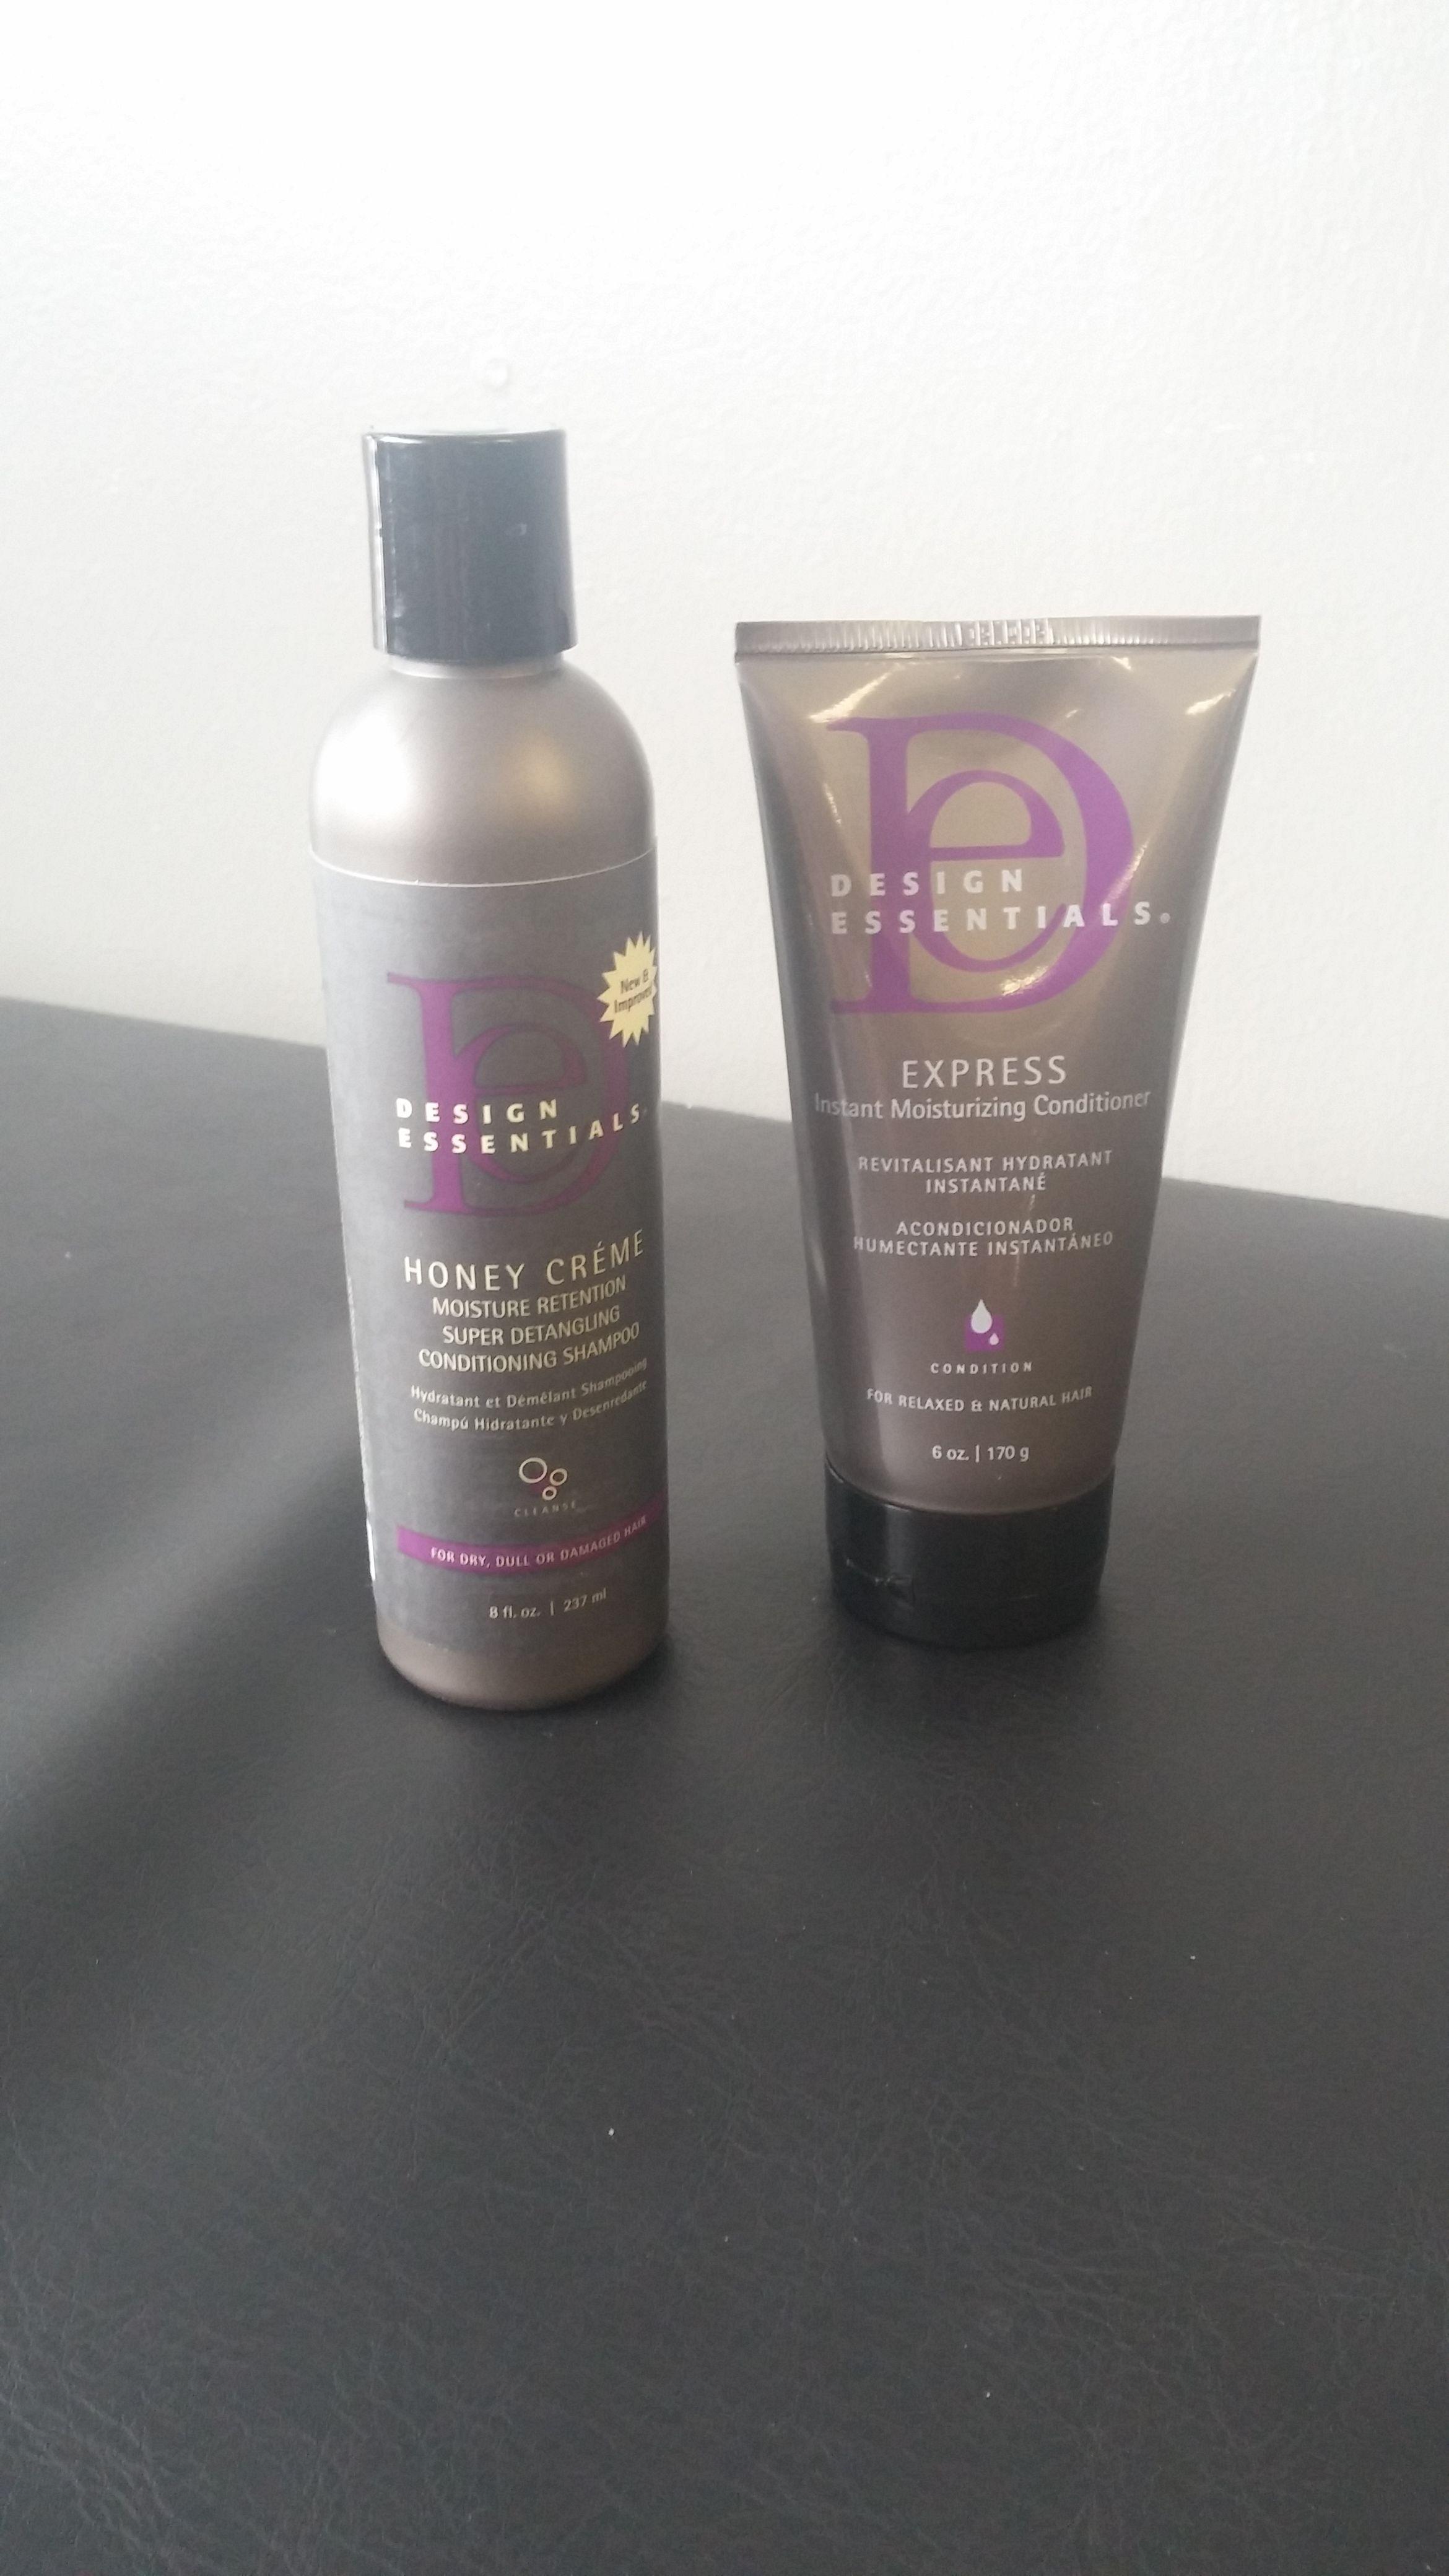 Design Essentials Honey Creme Conditioning Shampoo And Express